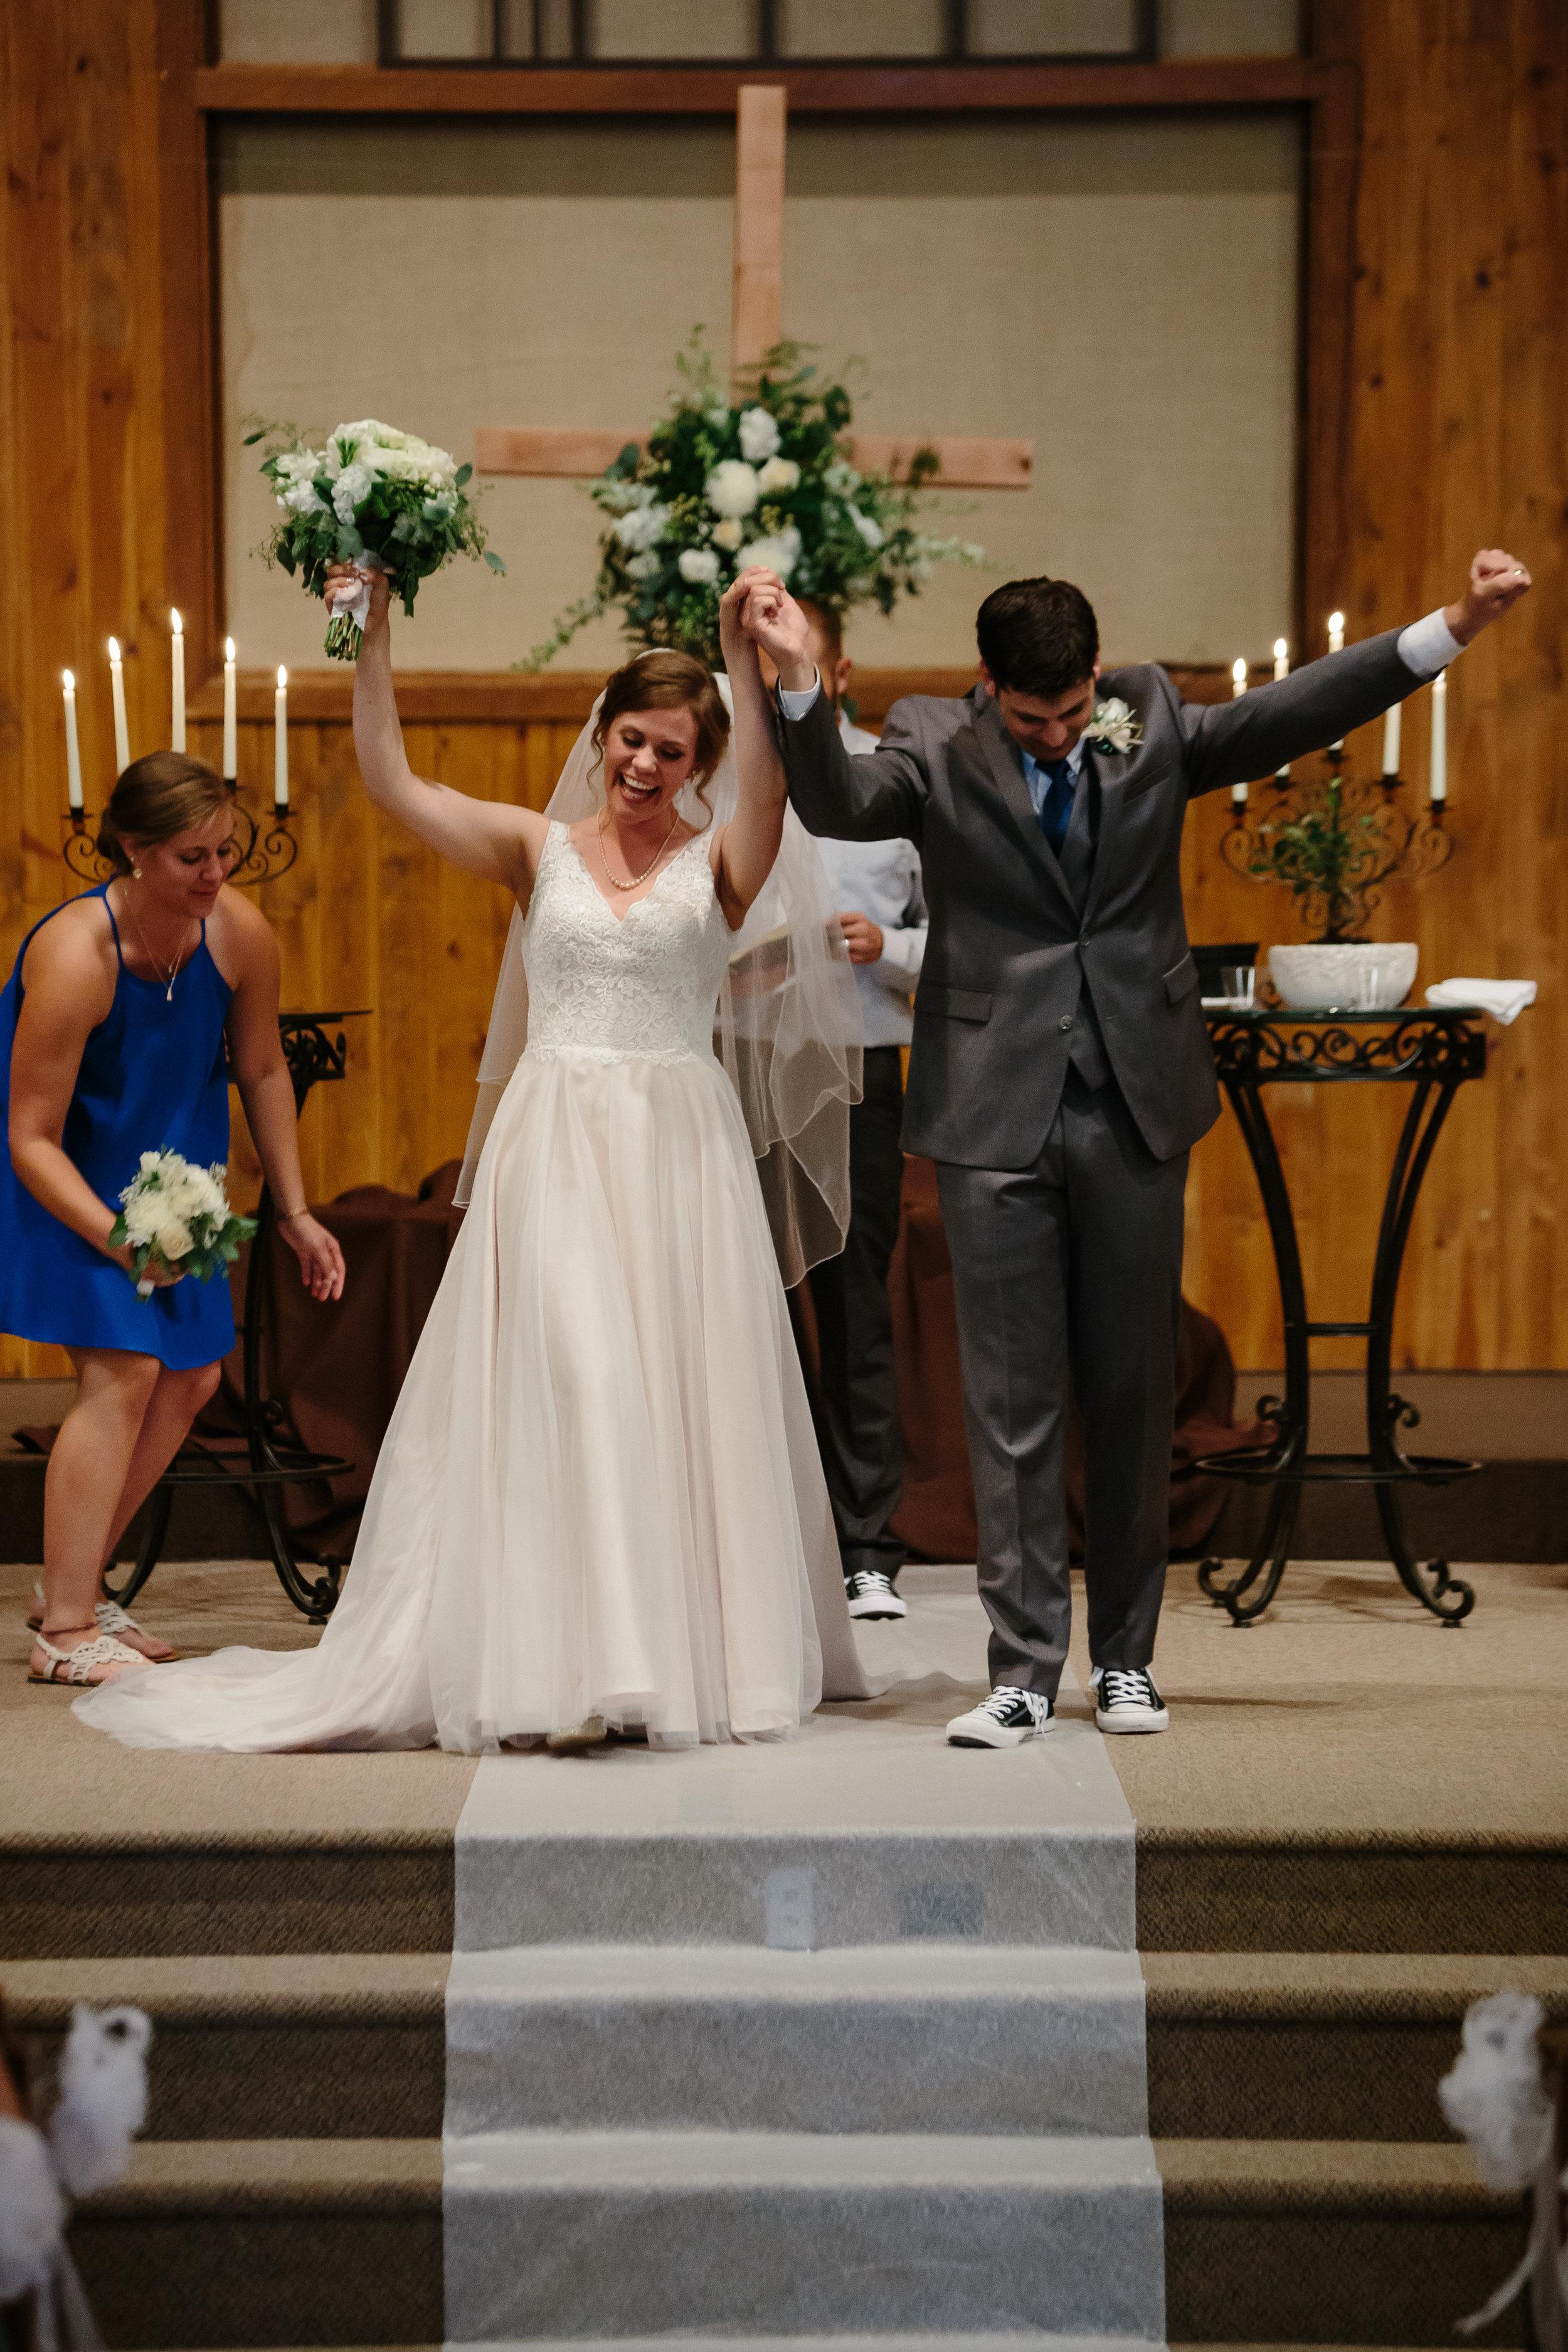 Jordan & Shantel Married - Idaho - Corrie Mick Photography-239.jpg